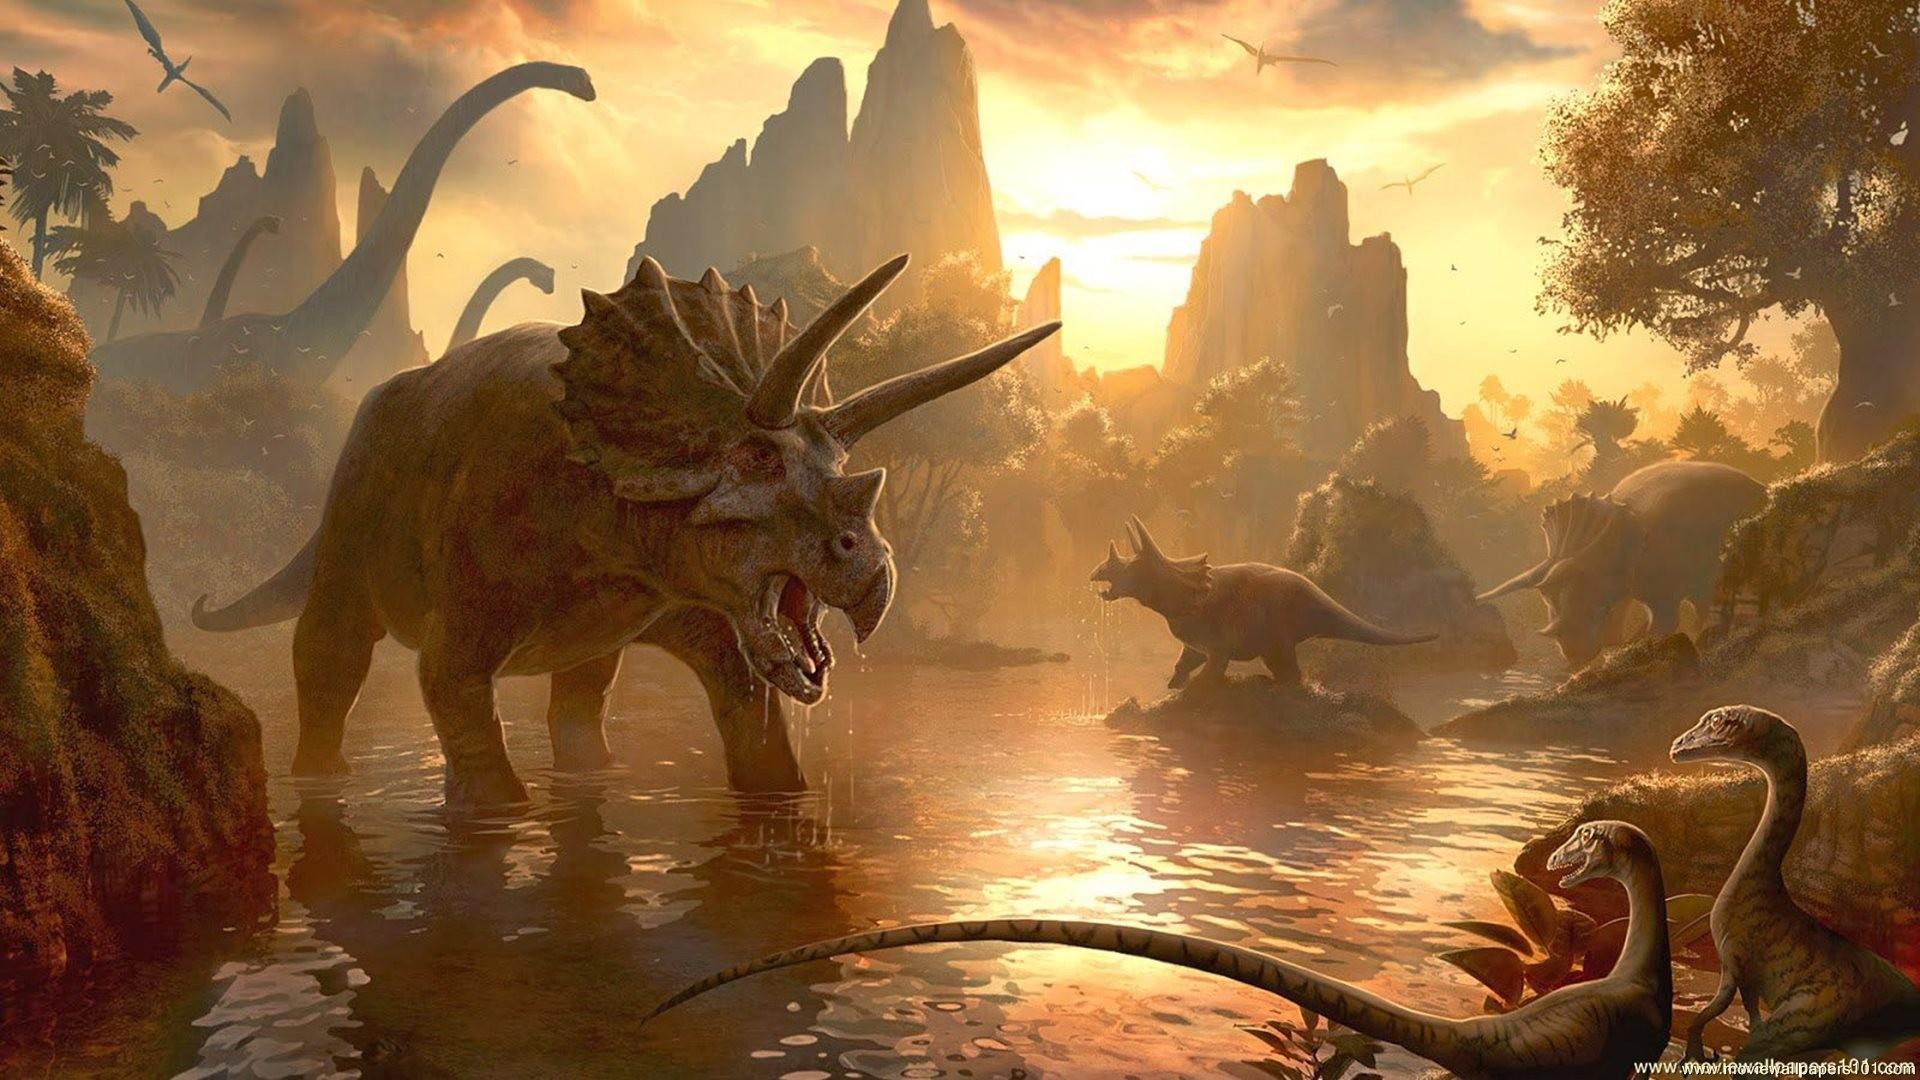 Res: 1920x1080, Jurassic World 2015 Movie Wallpaper